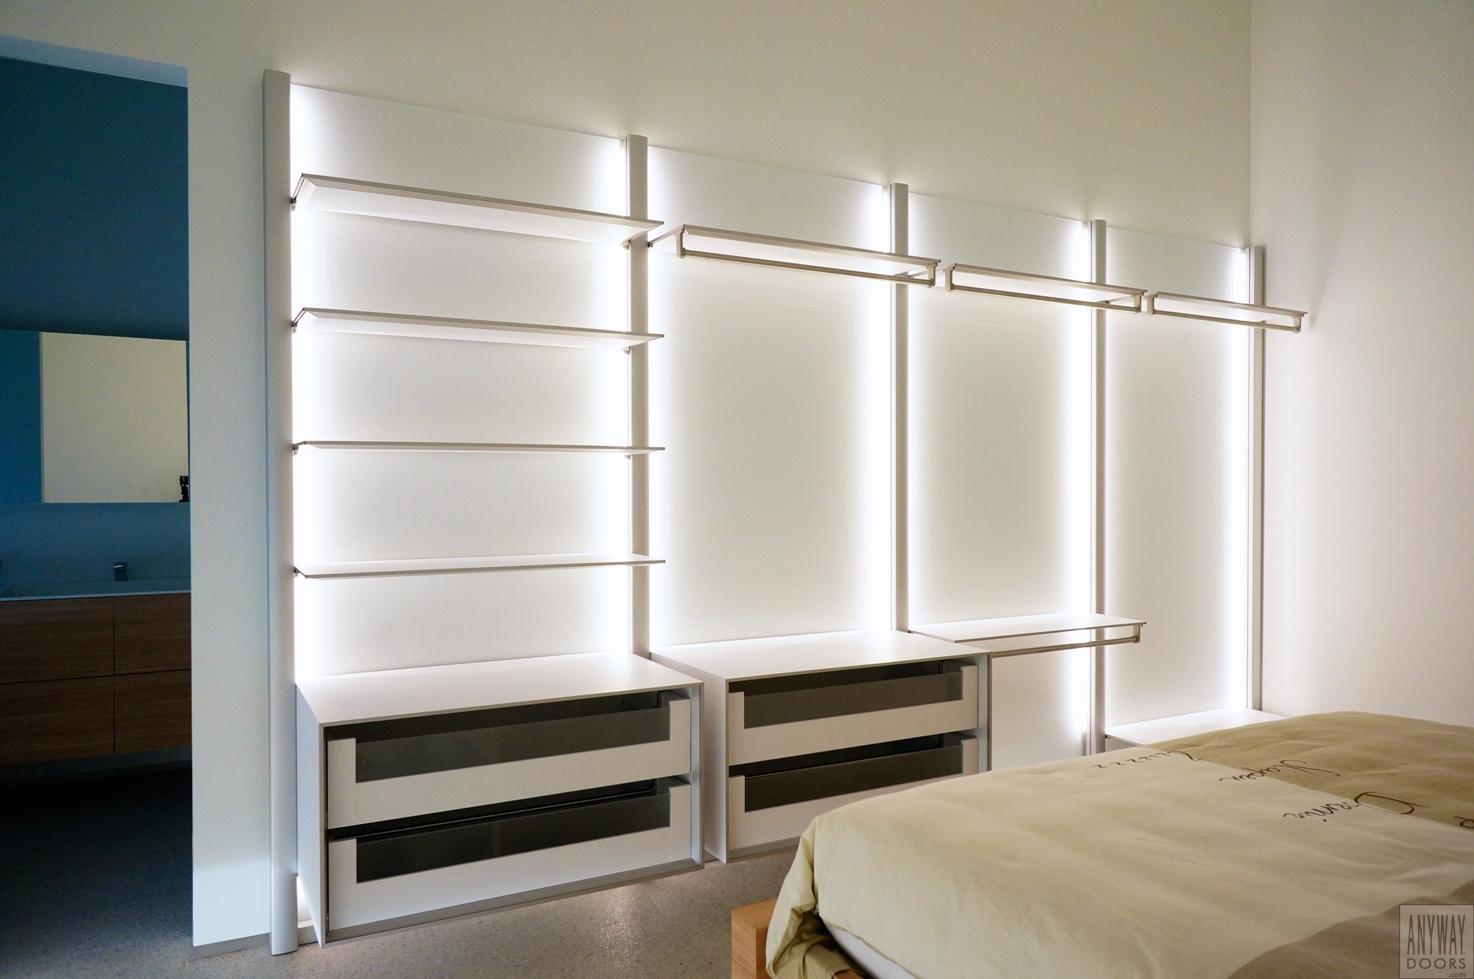 Verlichting slaapkamer modern ~ [Spscents.com]